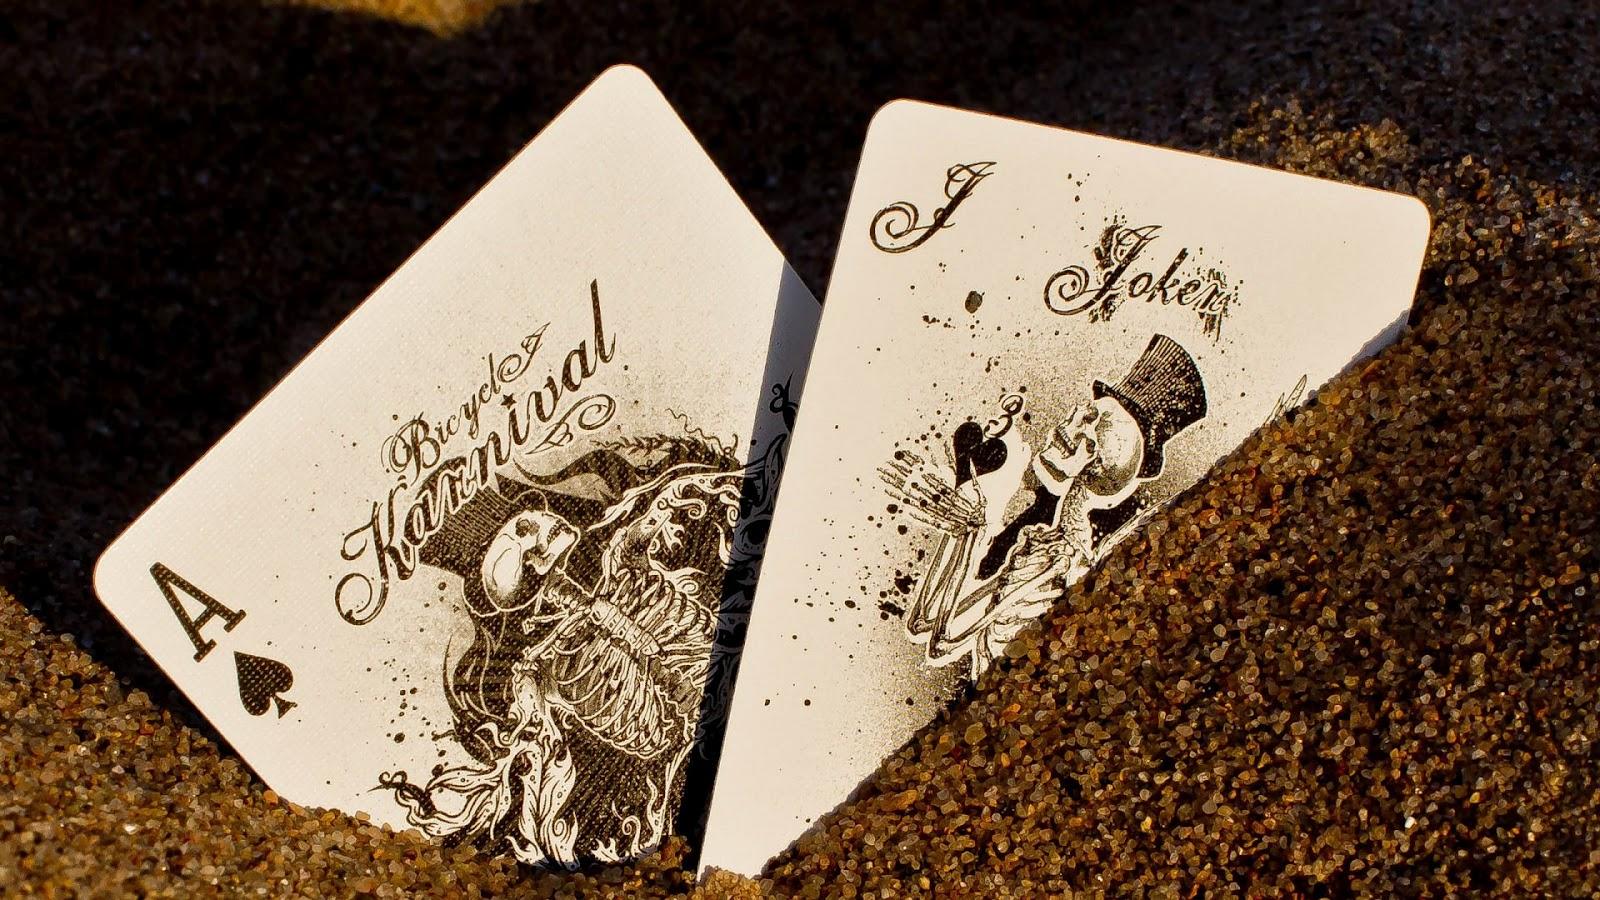 Karnival joker game cards mystery wallpaper - Cool card wallpapers ...